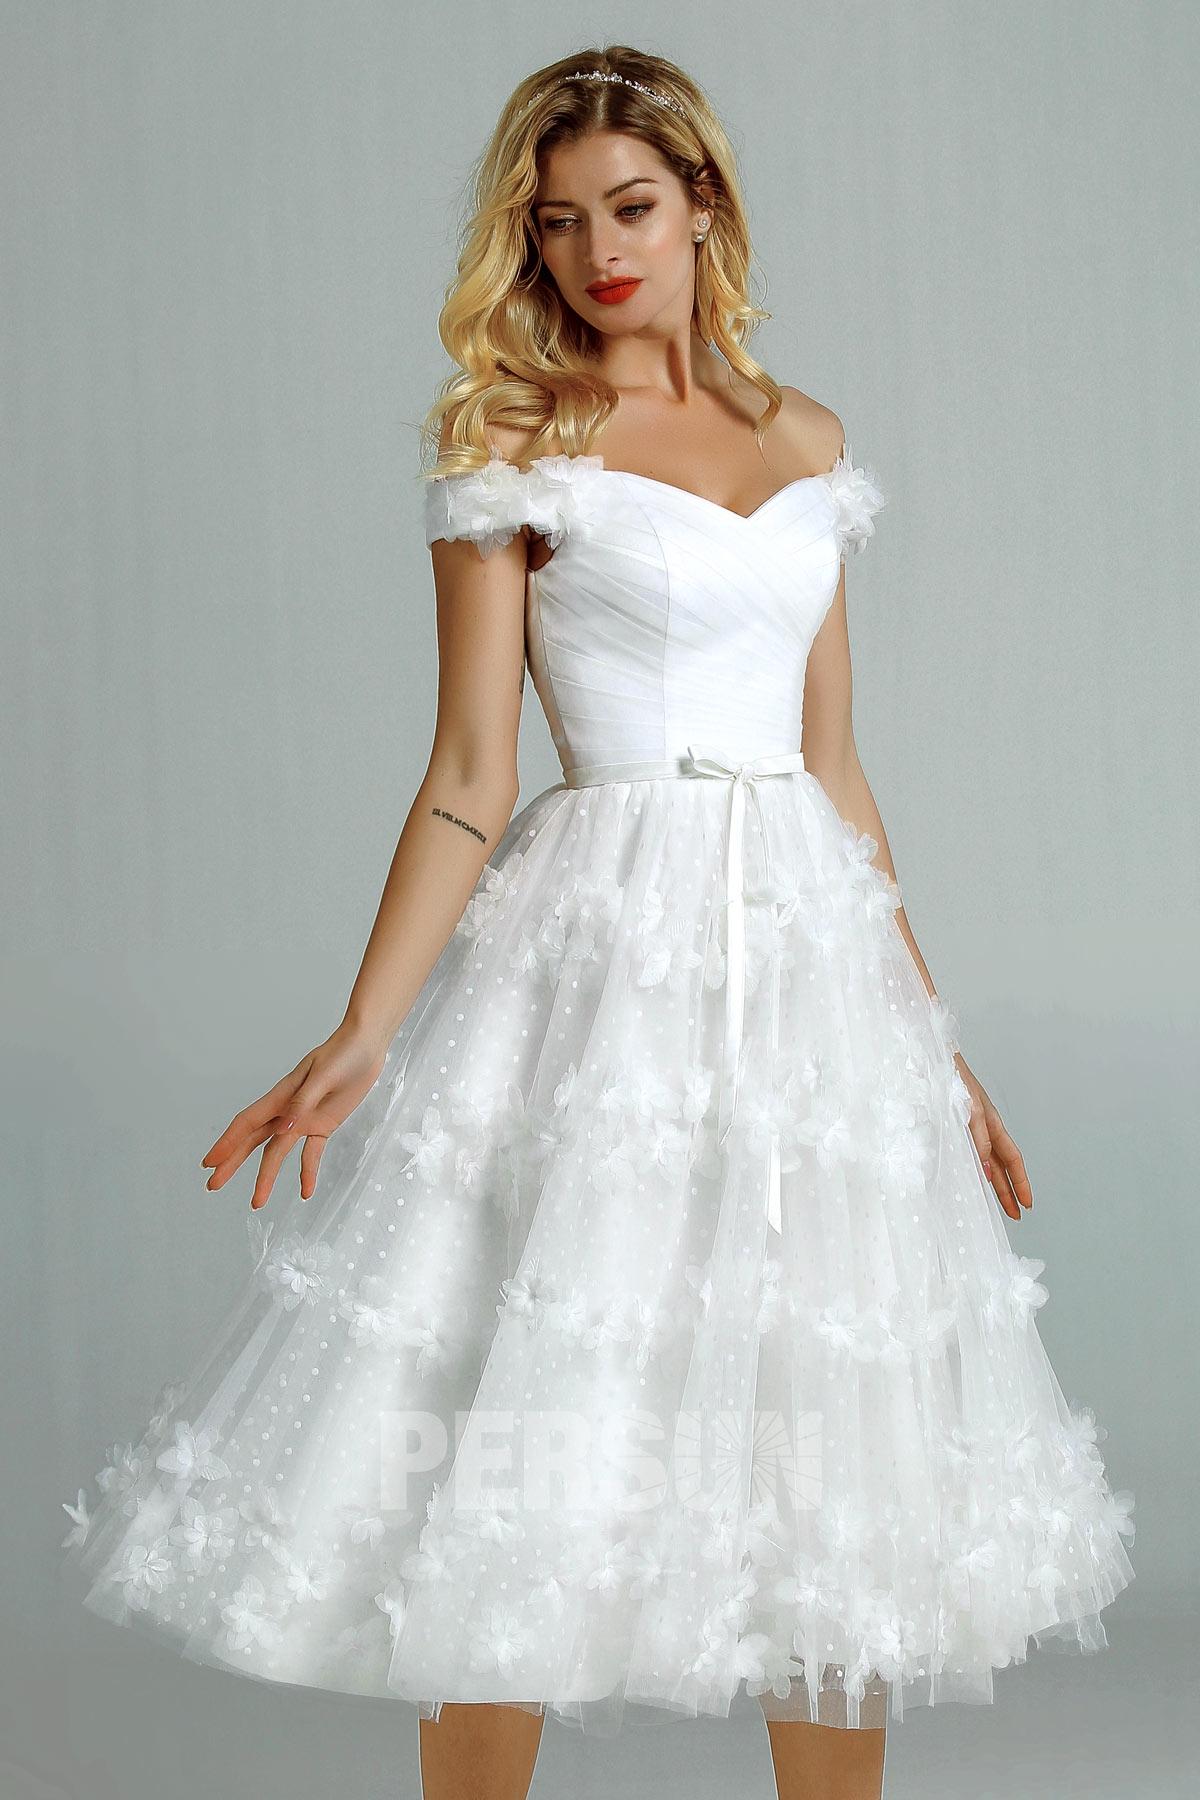 robe de mariée mi-longue col bardot embelli de fleur et de plumes